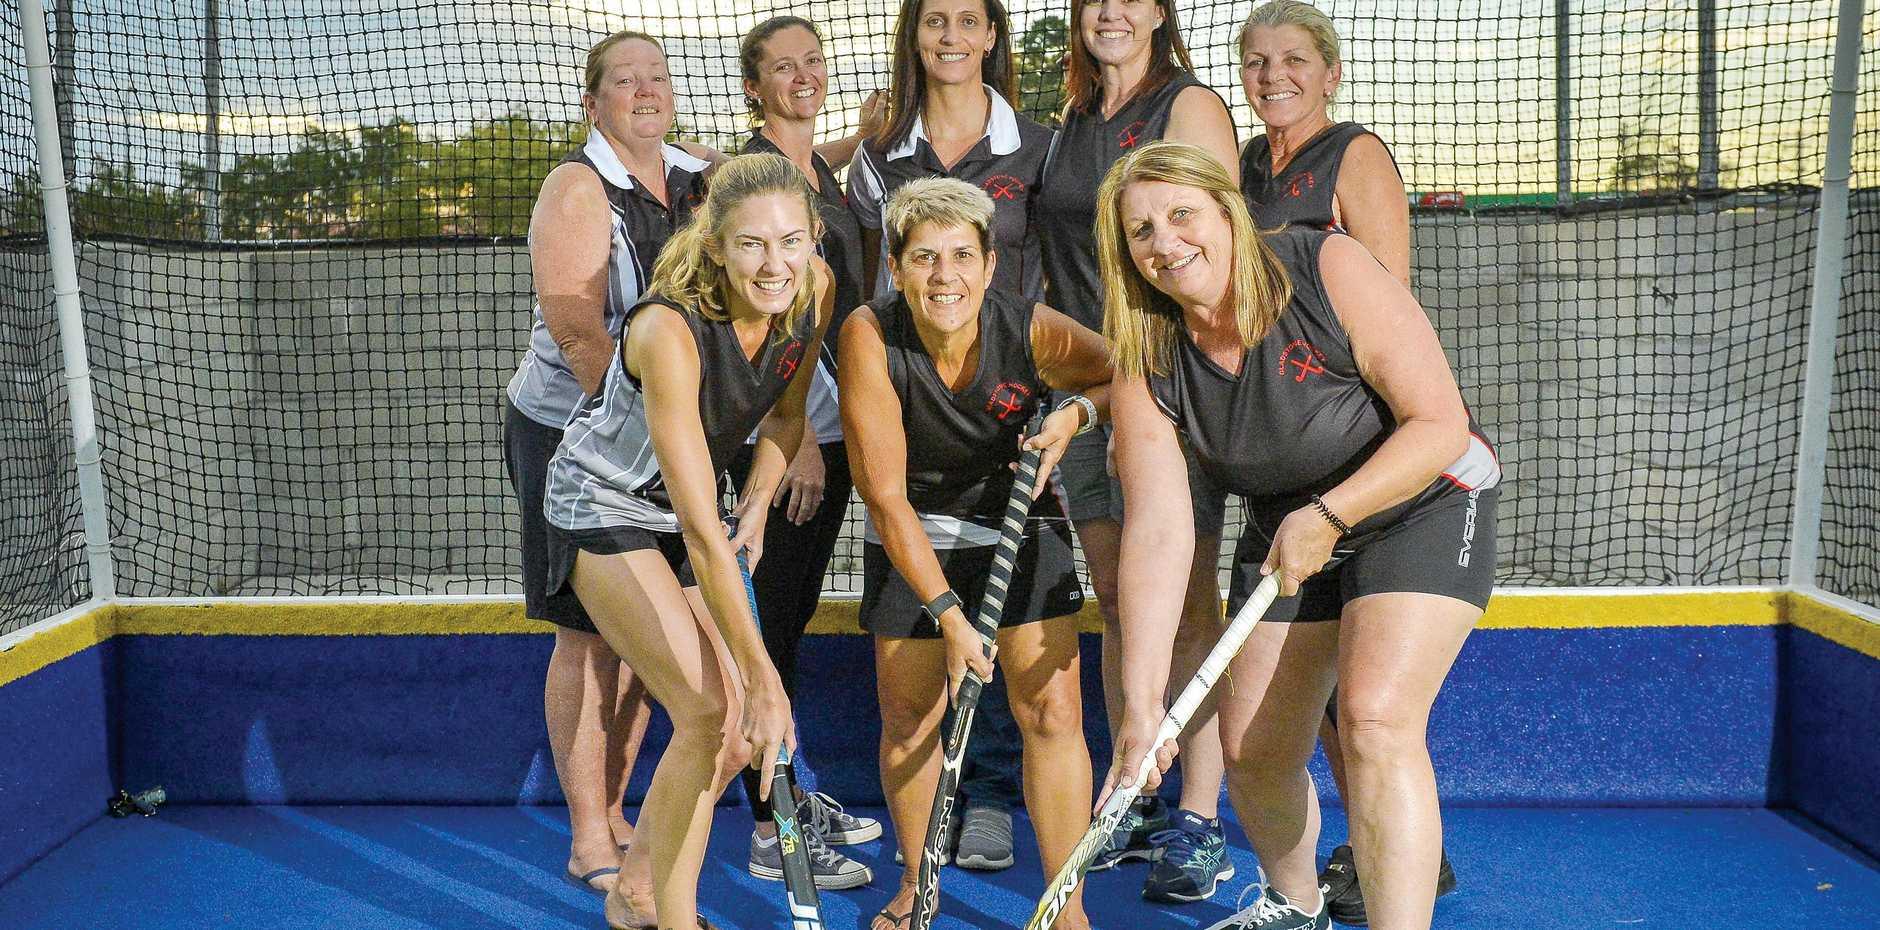 MADE GRADE: Gladstone Souths ' Deb Creighton, Kylie Blackmore, Joelene Smith, Caroline Pease, Carol Jones, Sue Rayner, Deb Dawes and Robyn Black are in Queensland Masters Teams.